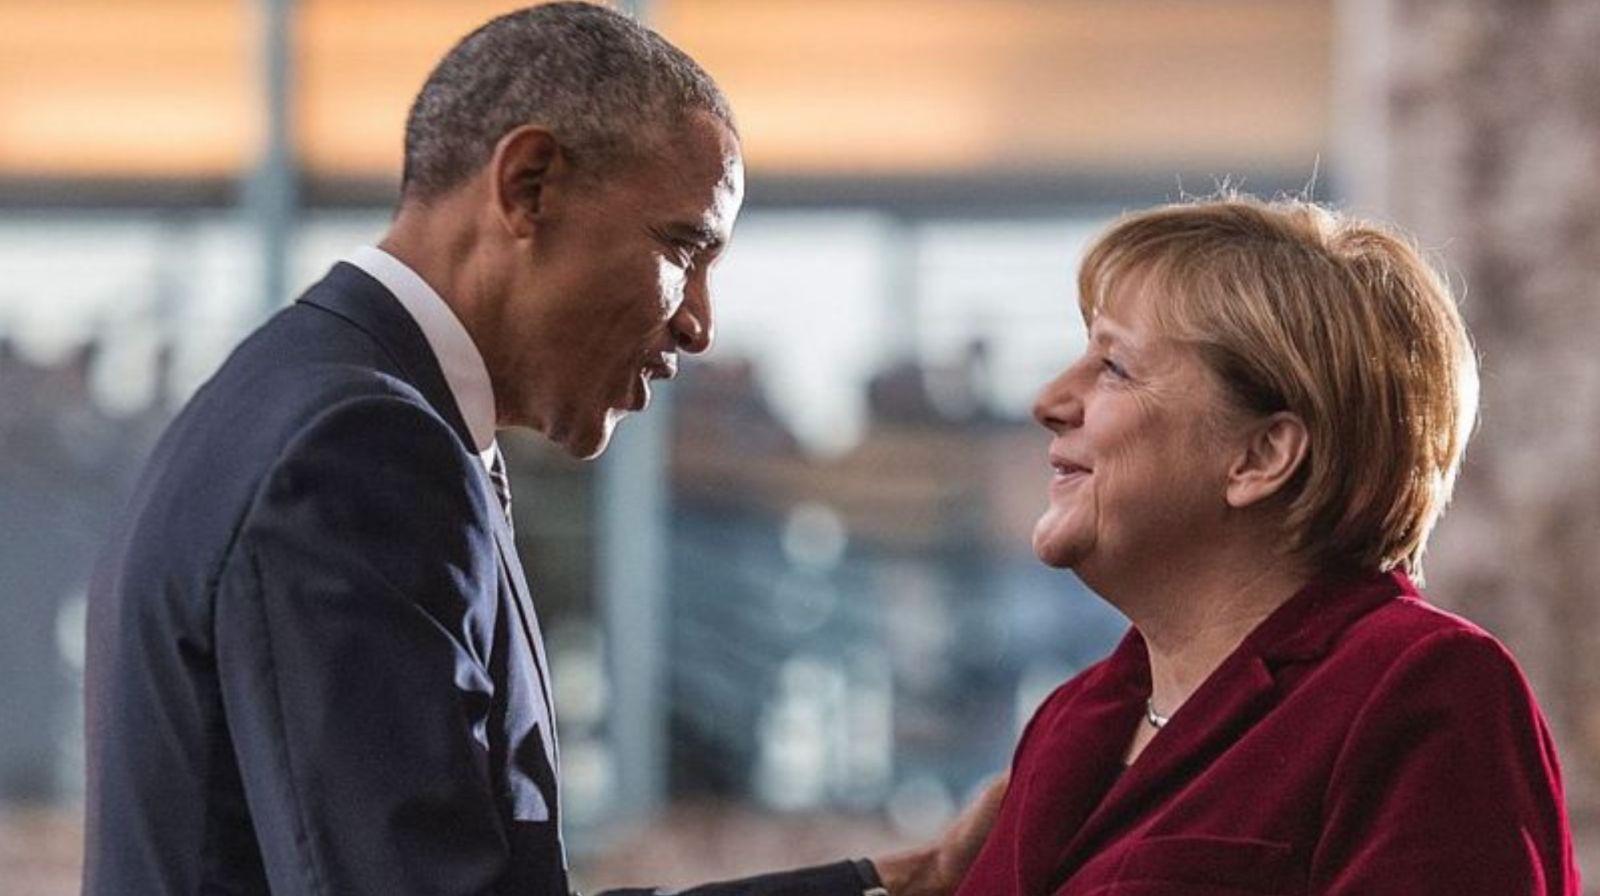 Barack Obama a décrit Angela Merkel